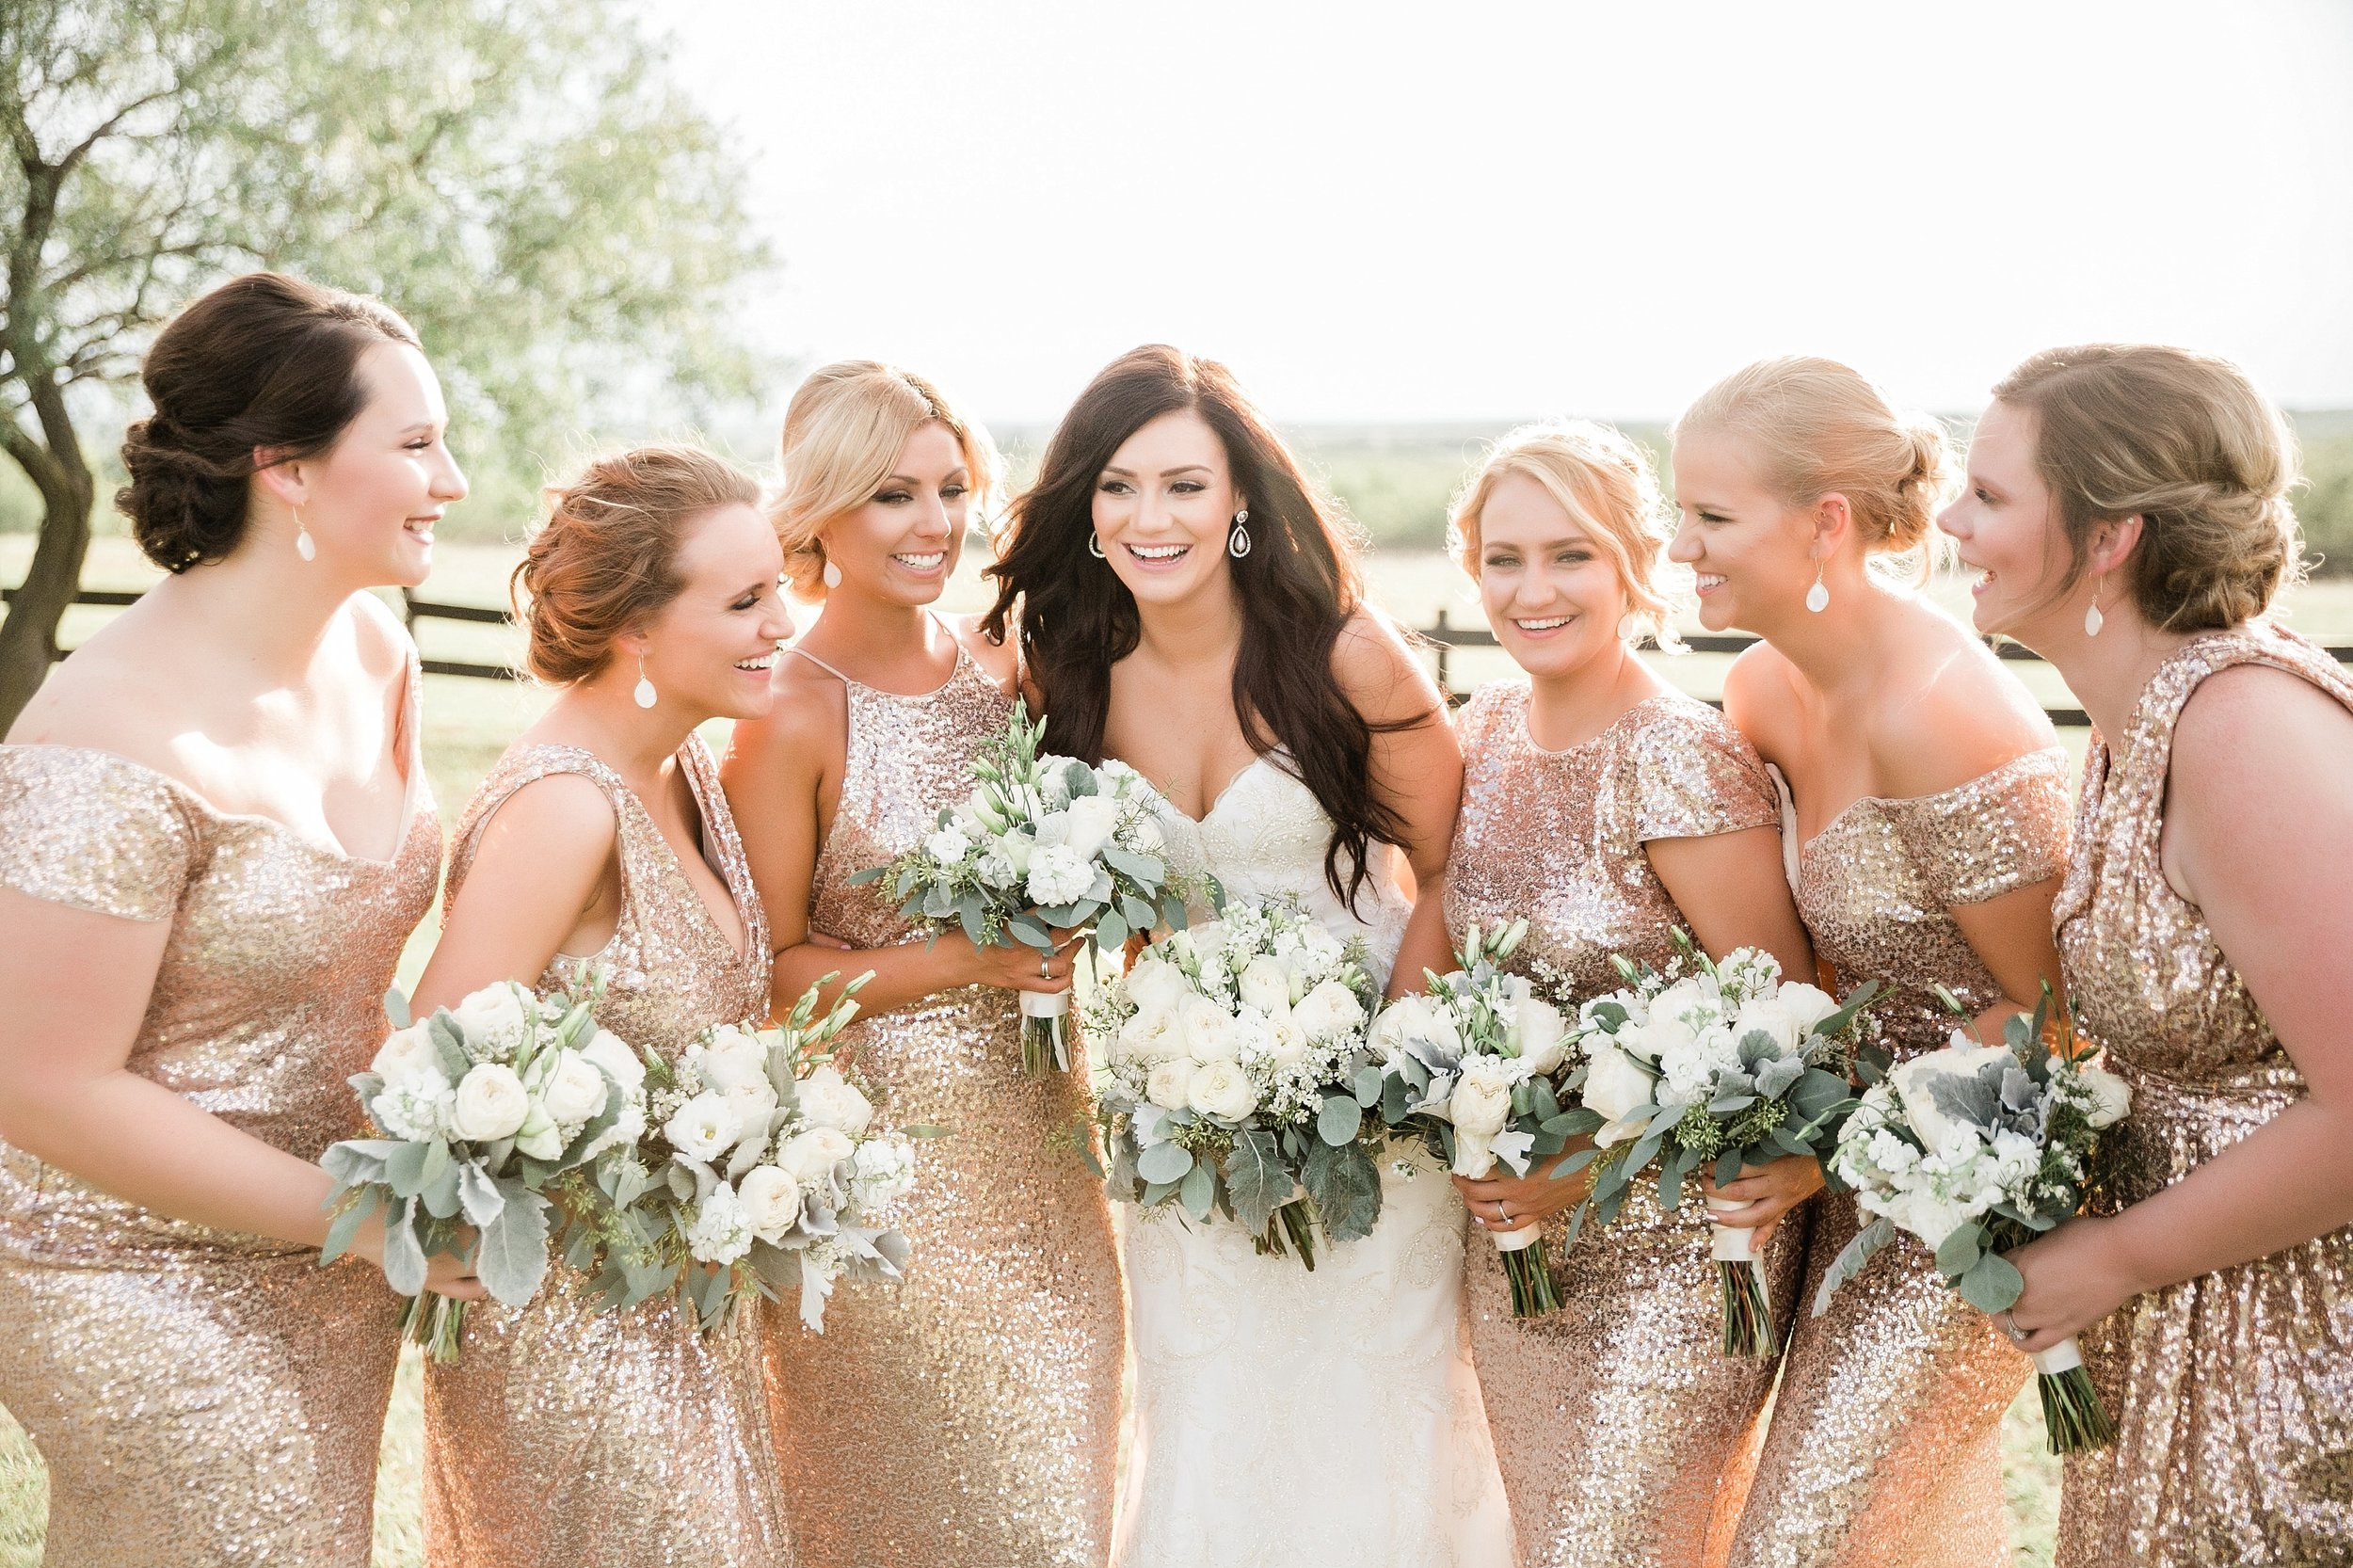 bailey-and-carl-coyote-ranch-resort-wedding-photographer-wichita-falls-texas-destination-wedding-0034.jpg